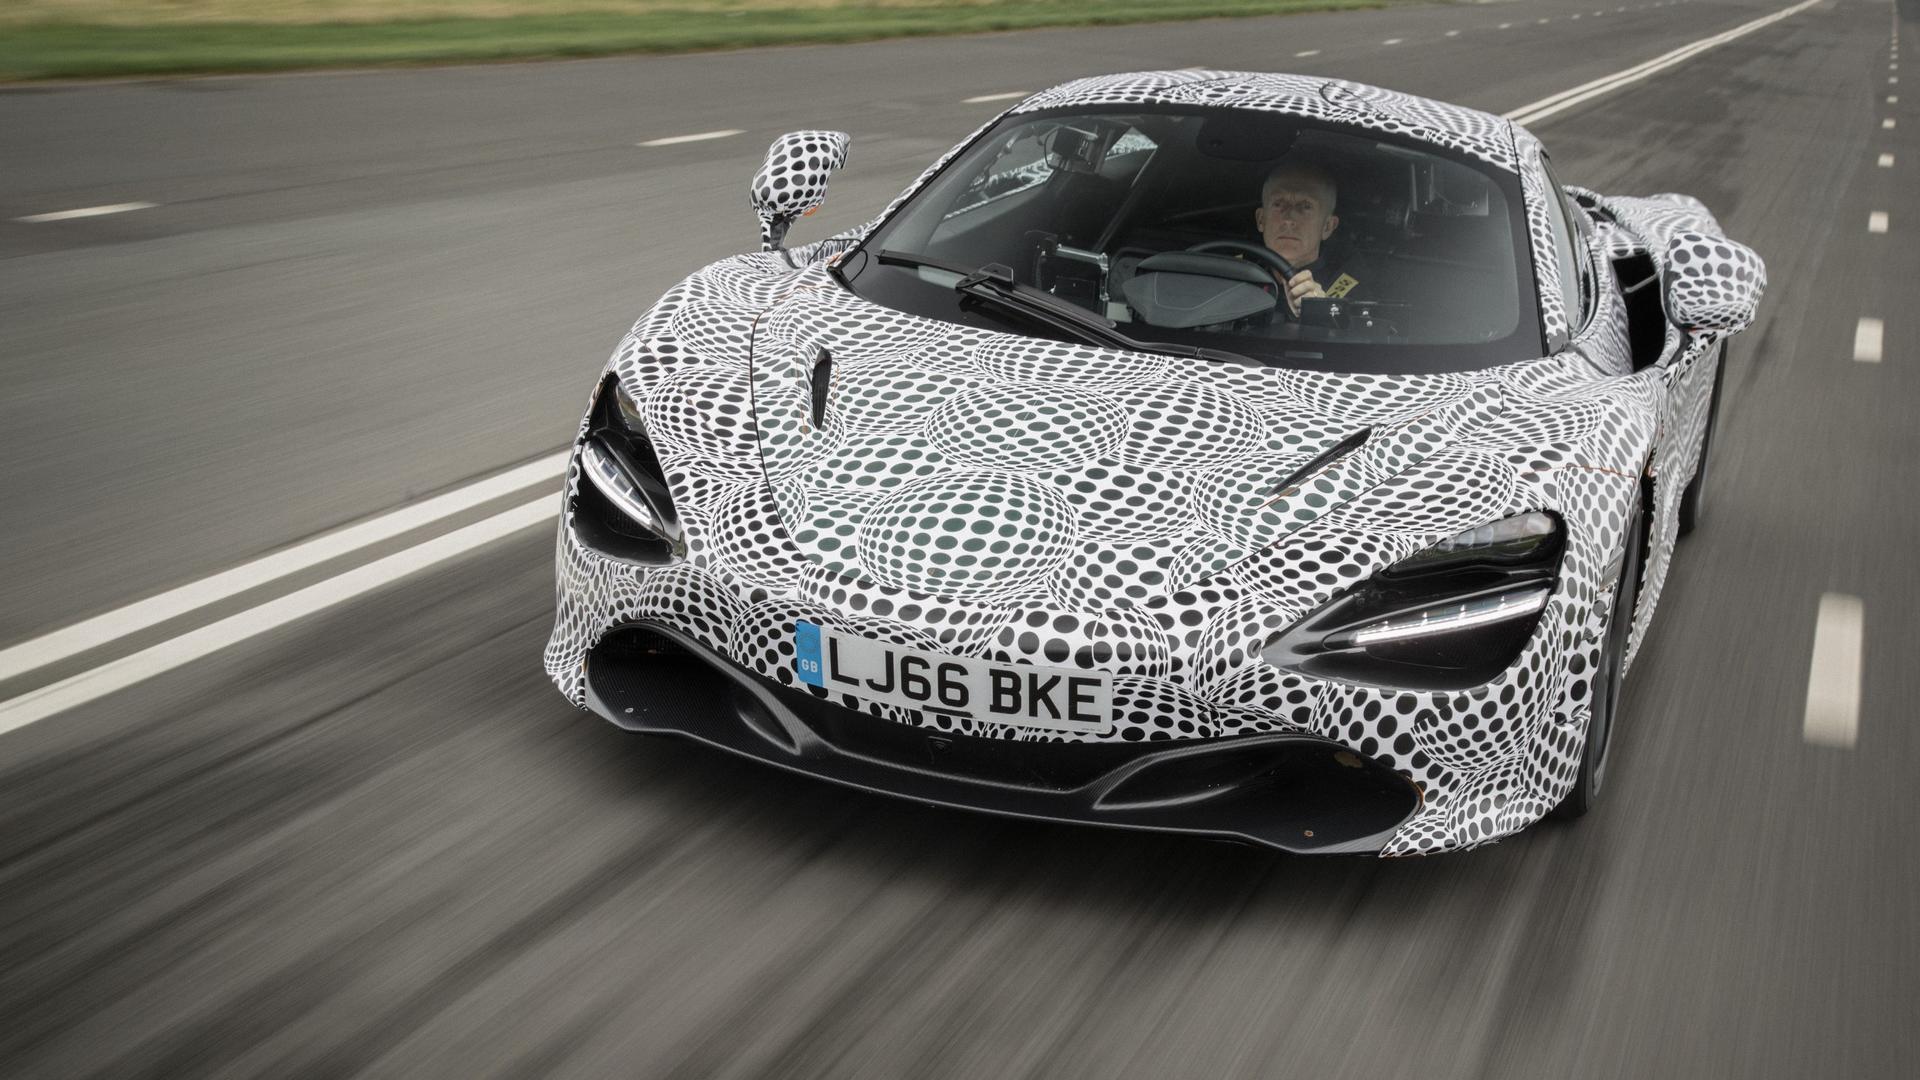 McLaren BP23 Hyper GT Test Mule ...